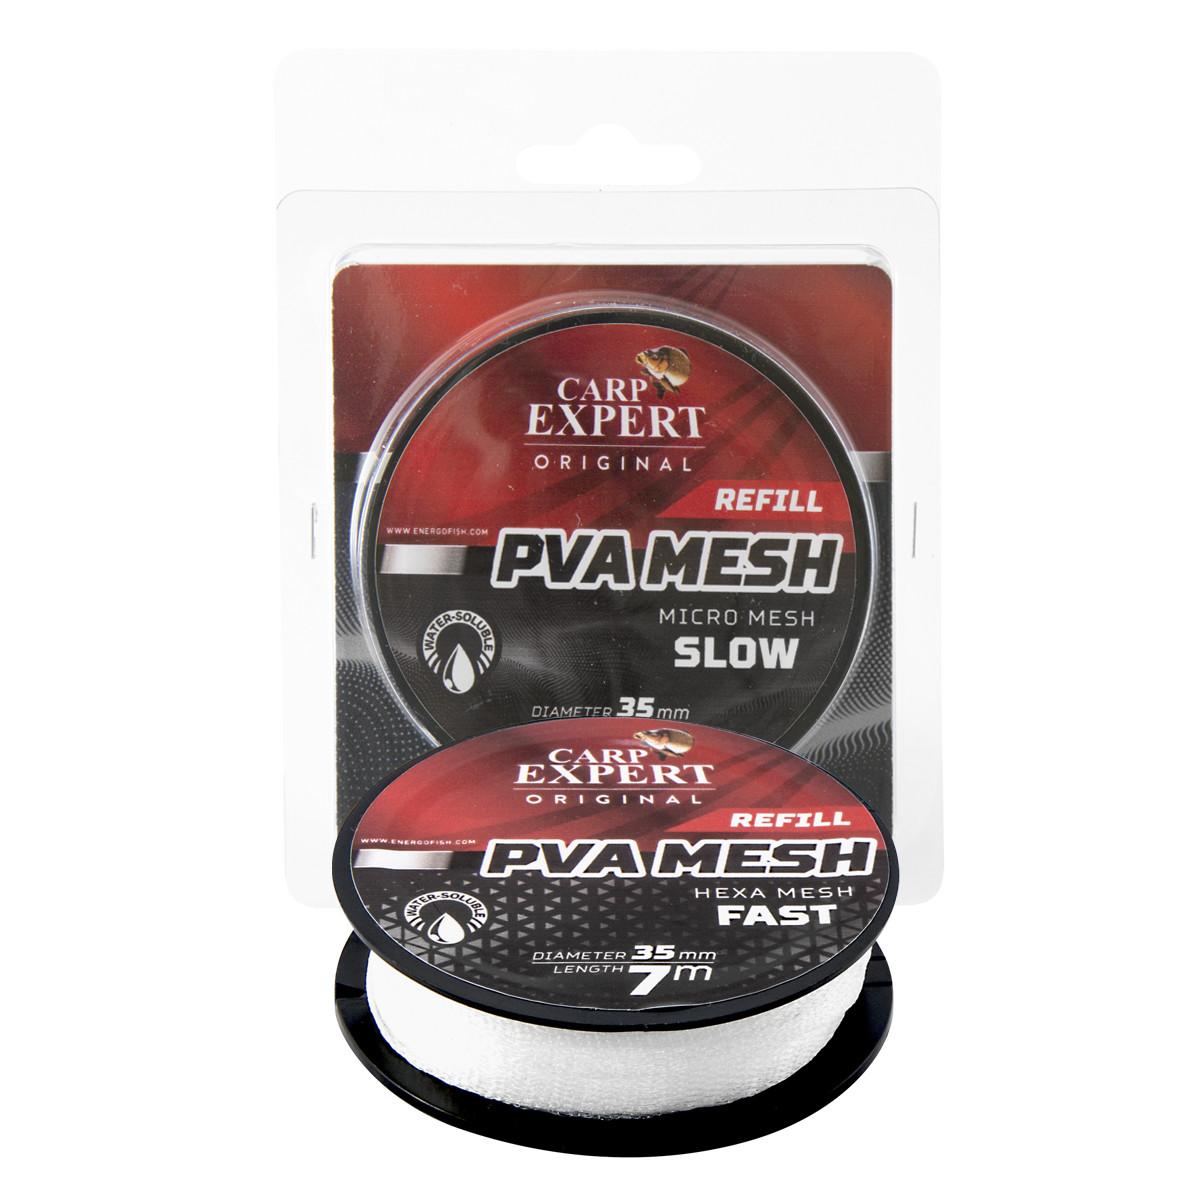 ПВА-сетка 7м 25мм на шпуле Energofish Carp Expert PVA Refill Micro Mesh Slow Melt (30141225)